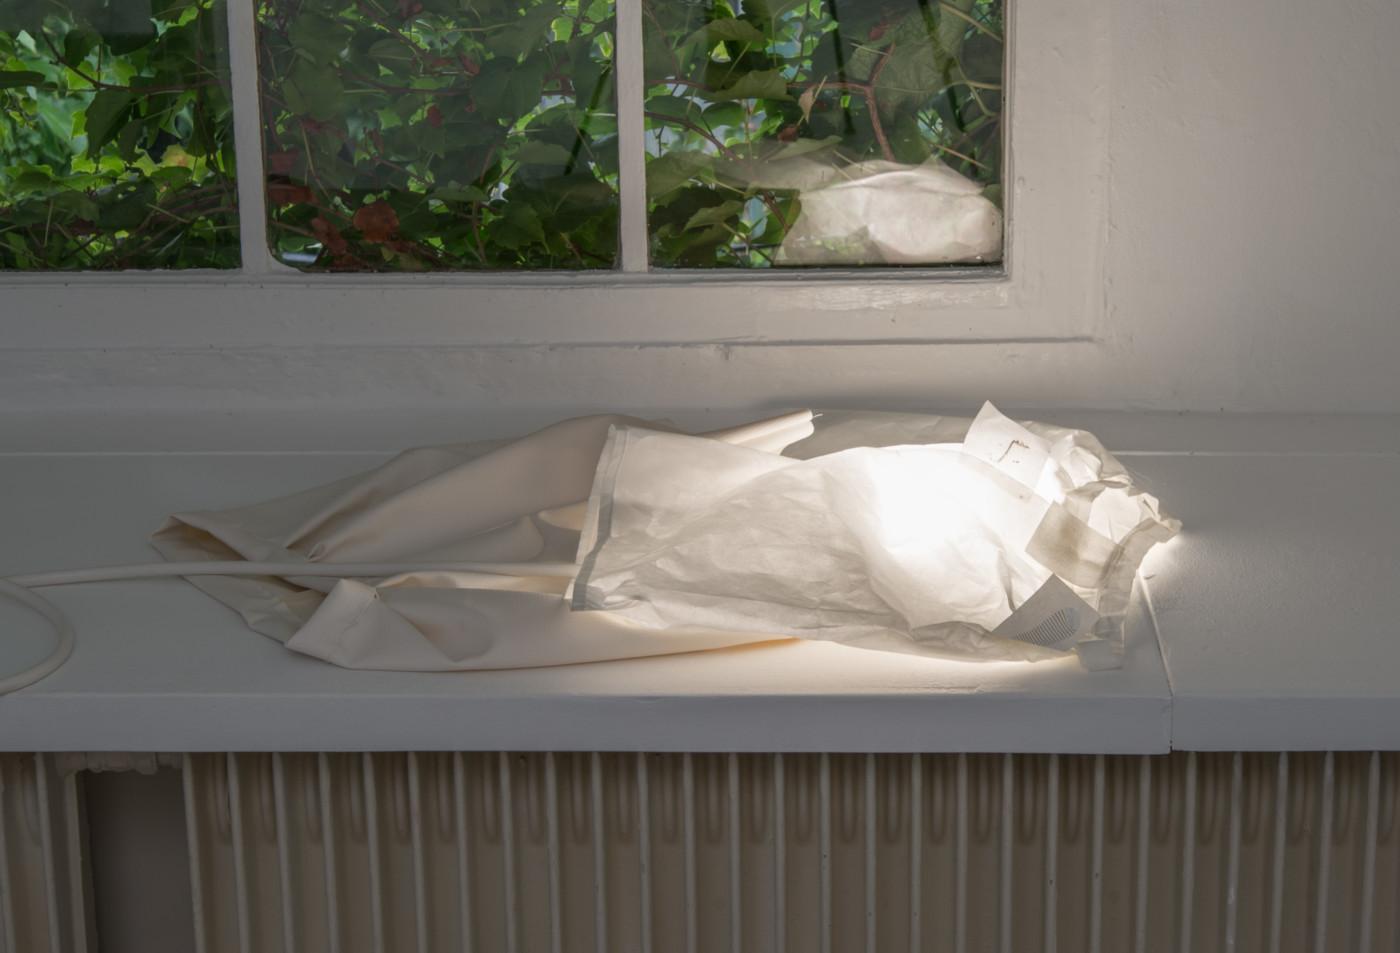 MÉLANIE MATRANGA  Ascendant , 2018 Paper, electrical cords wires, light bulbs 46 x 68 x 2 cm / 18.1 x 26.7 x 0.7 in - High Art Gallery Paris